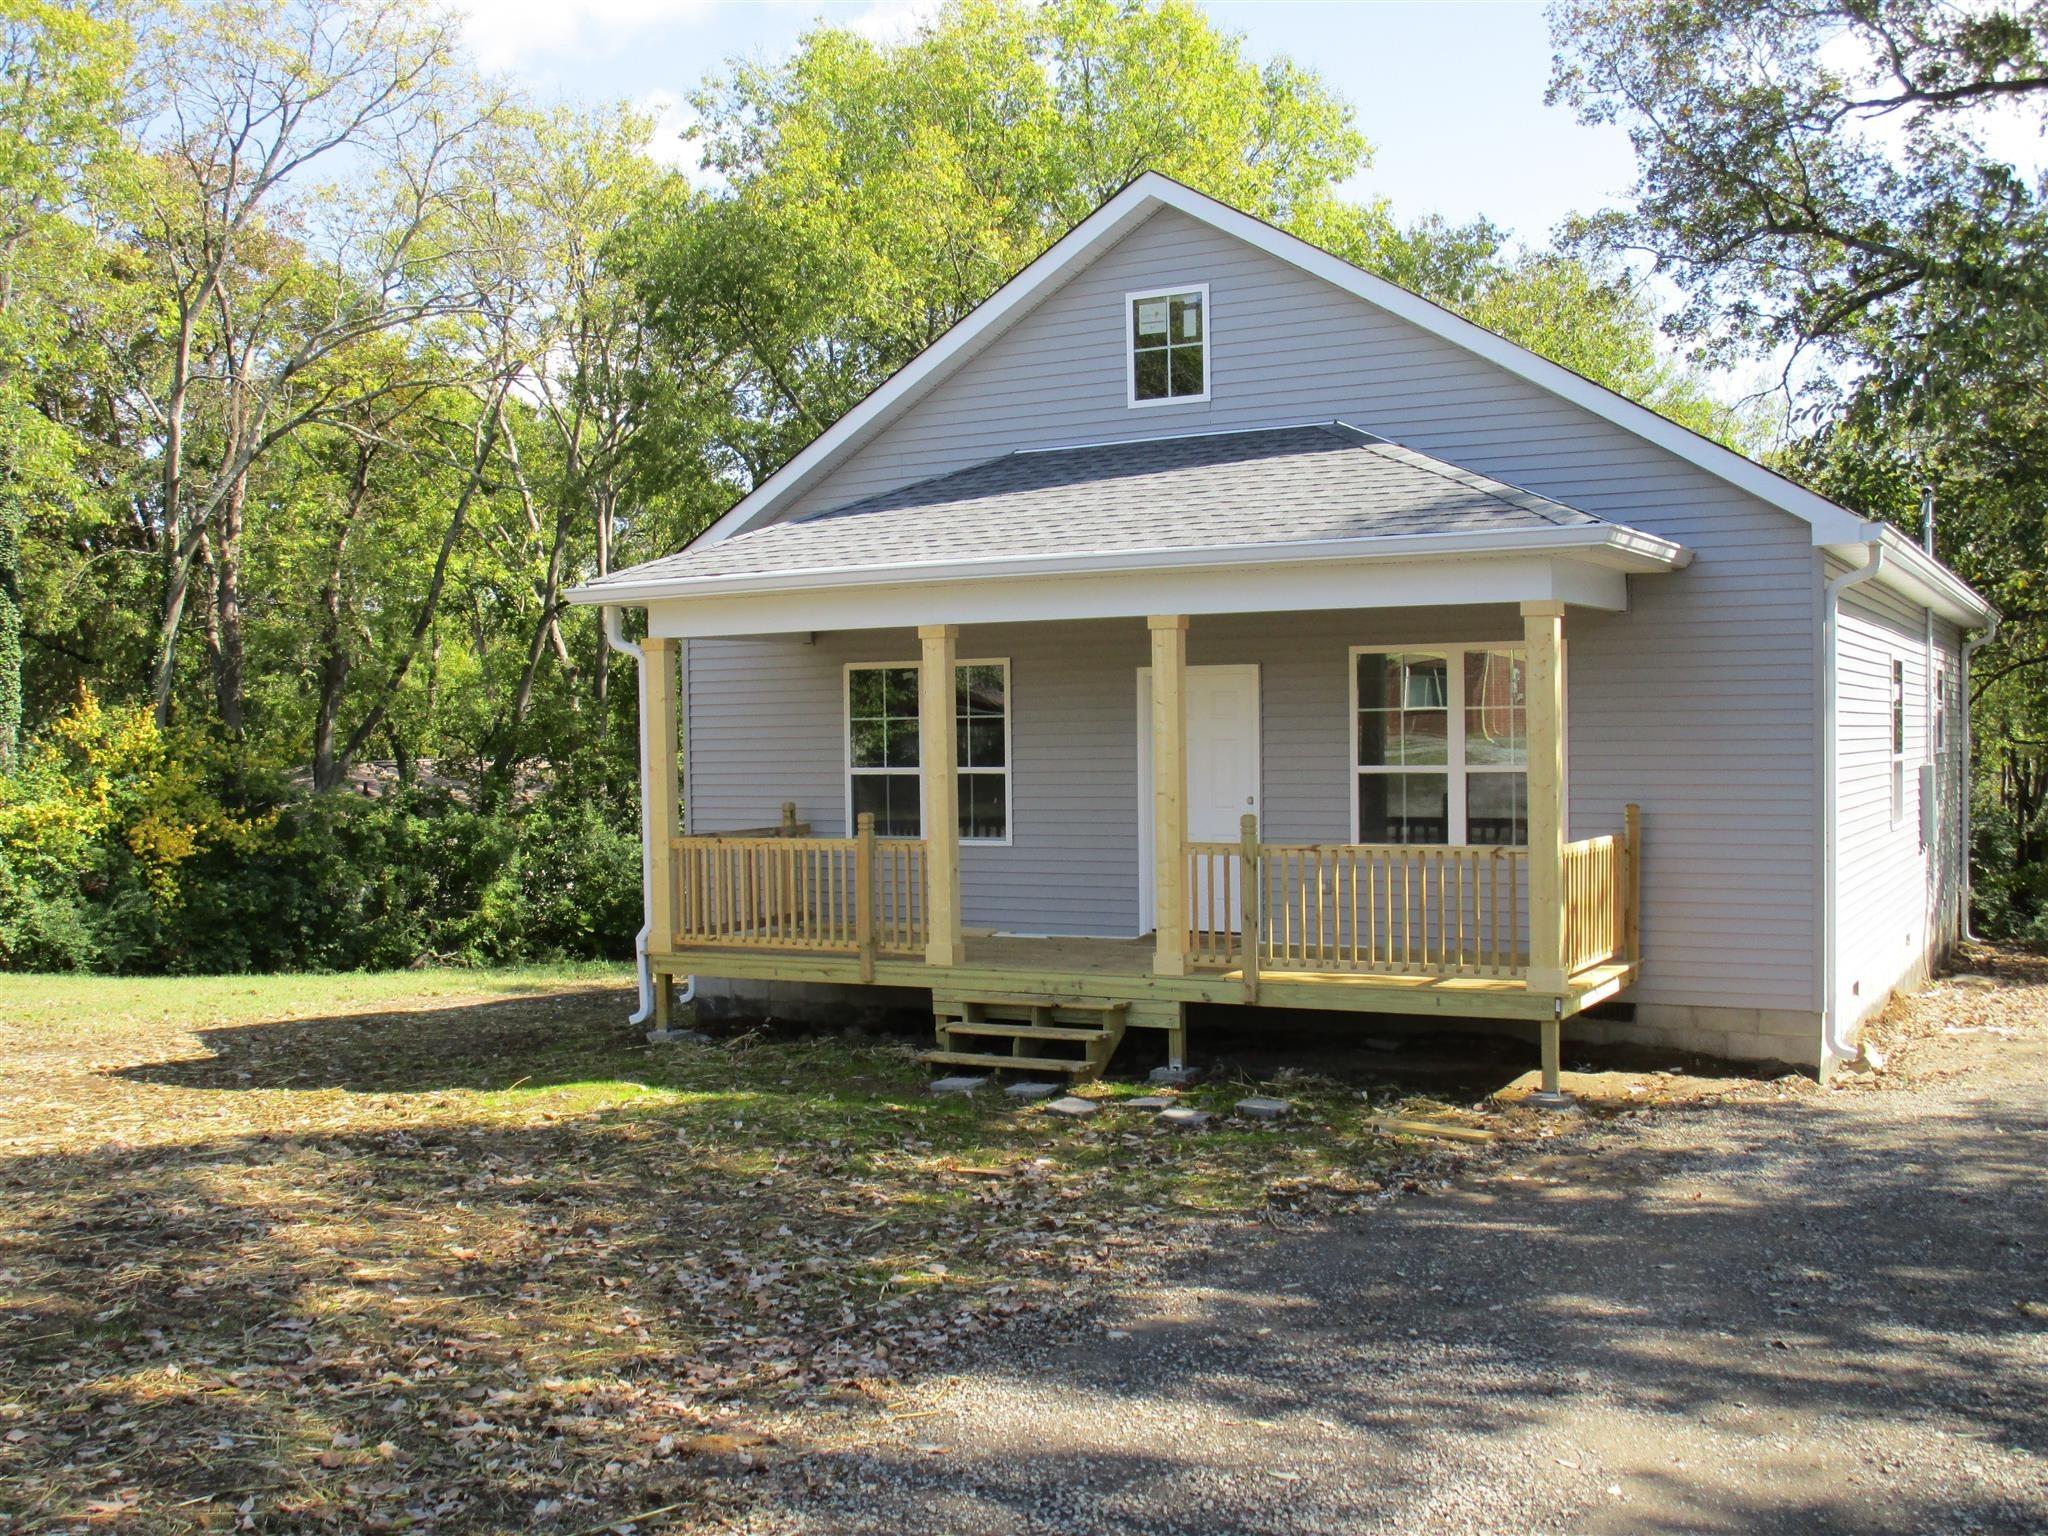 610 Bixler Ave, Madison, TN 37115 - Madison, TN real estate listing